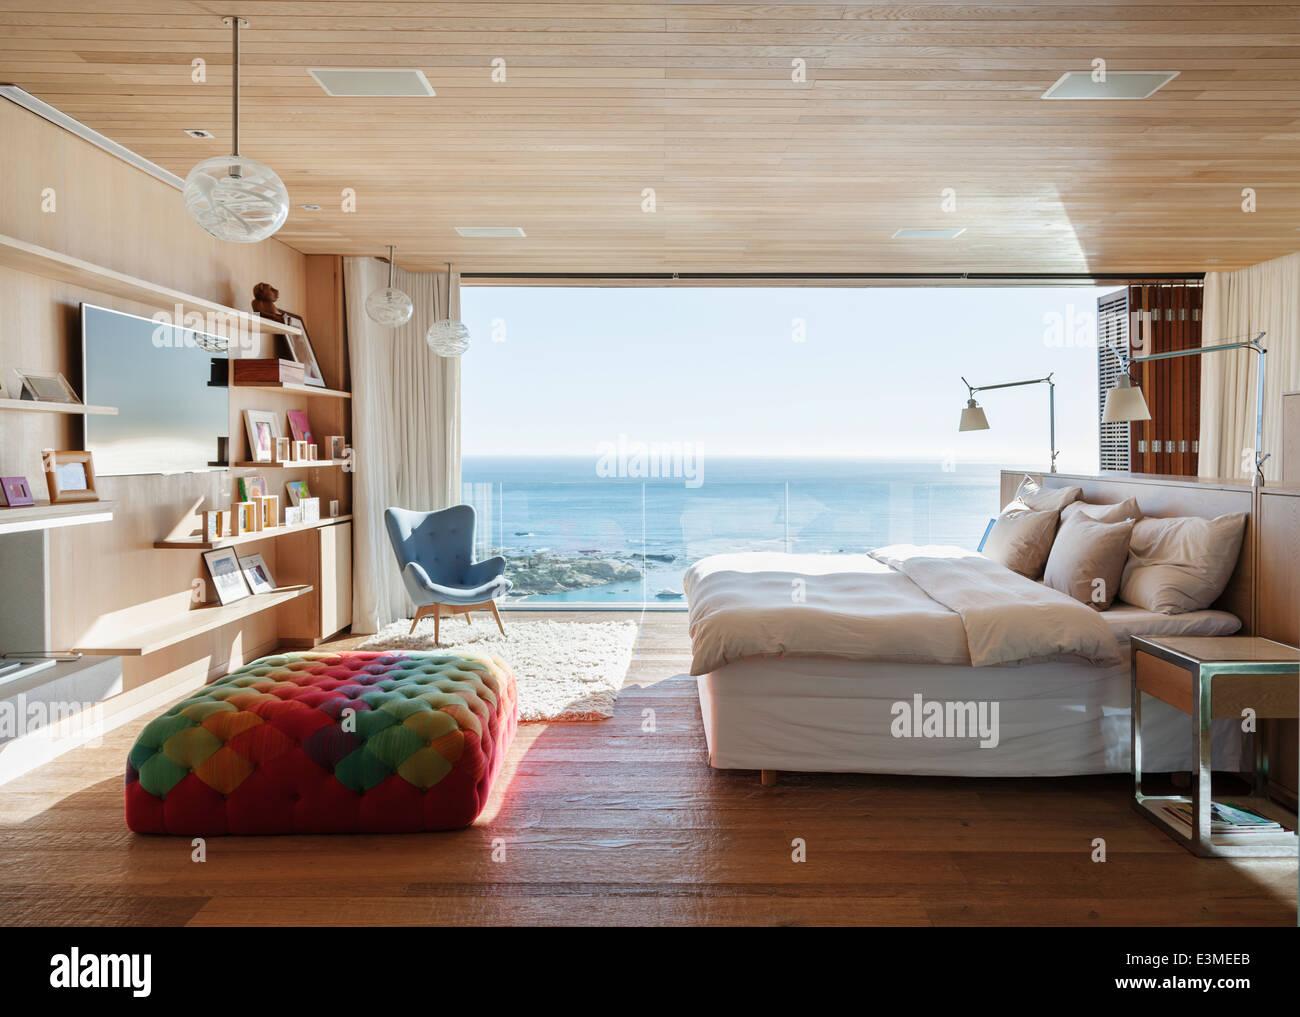 Sunny Bedroom With Ocean View Stock Photo 71135859 Alamy